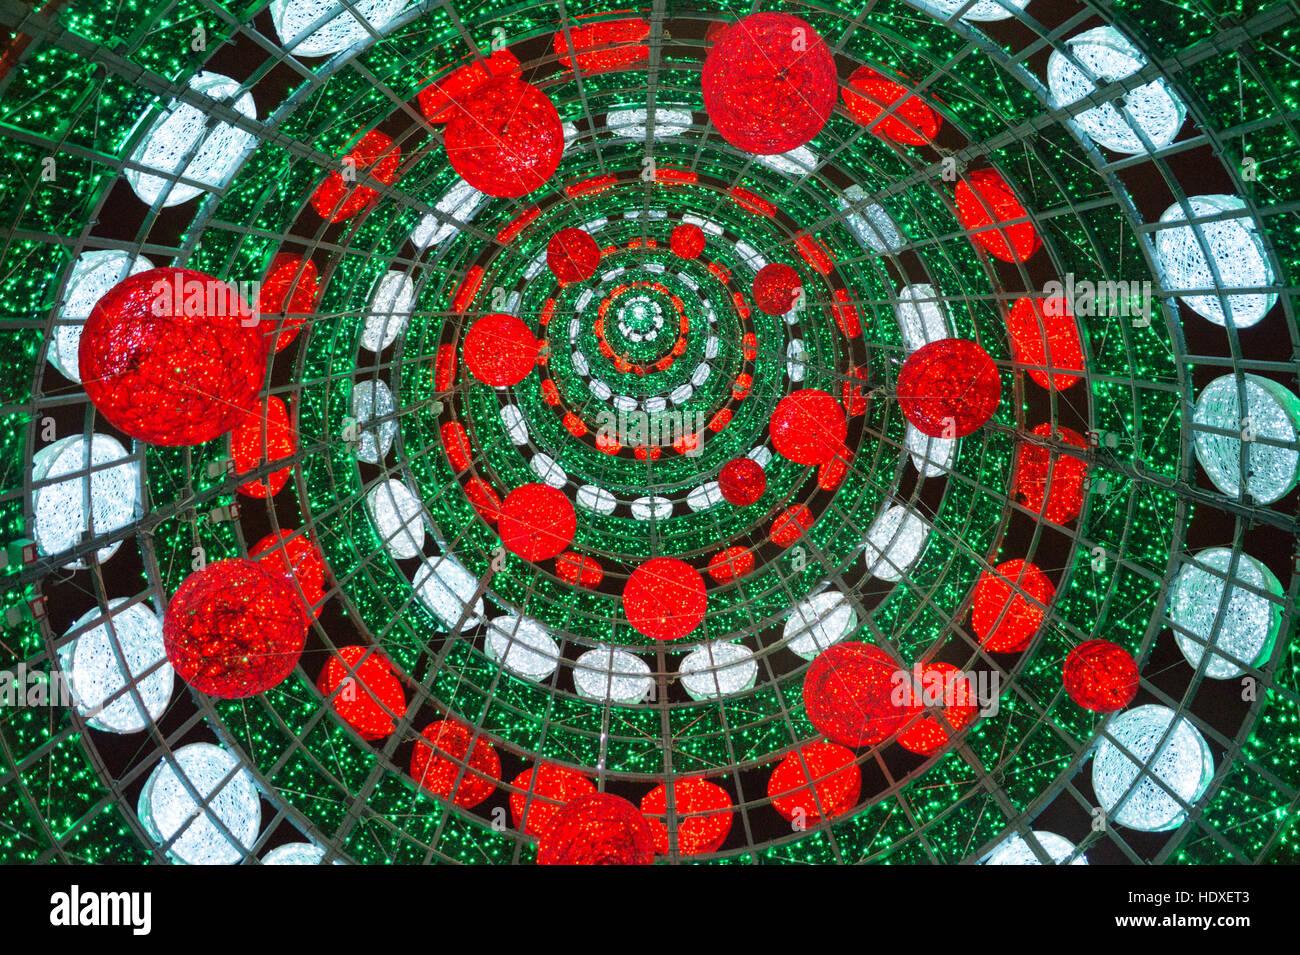 christmas-tree-arco-da-rua-augusta-augus